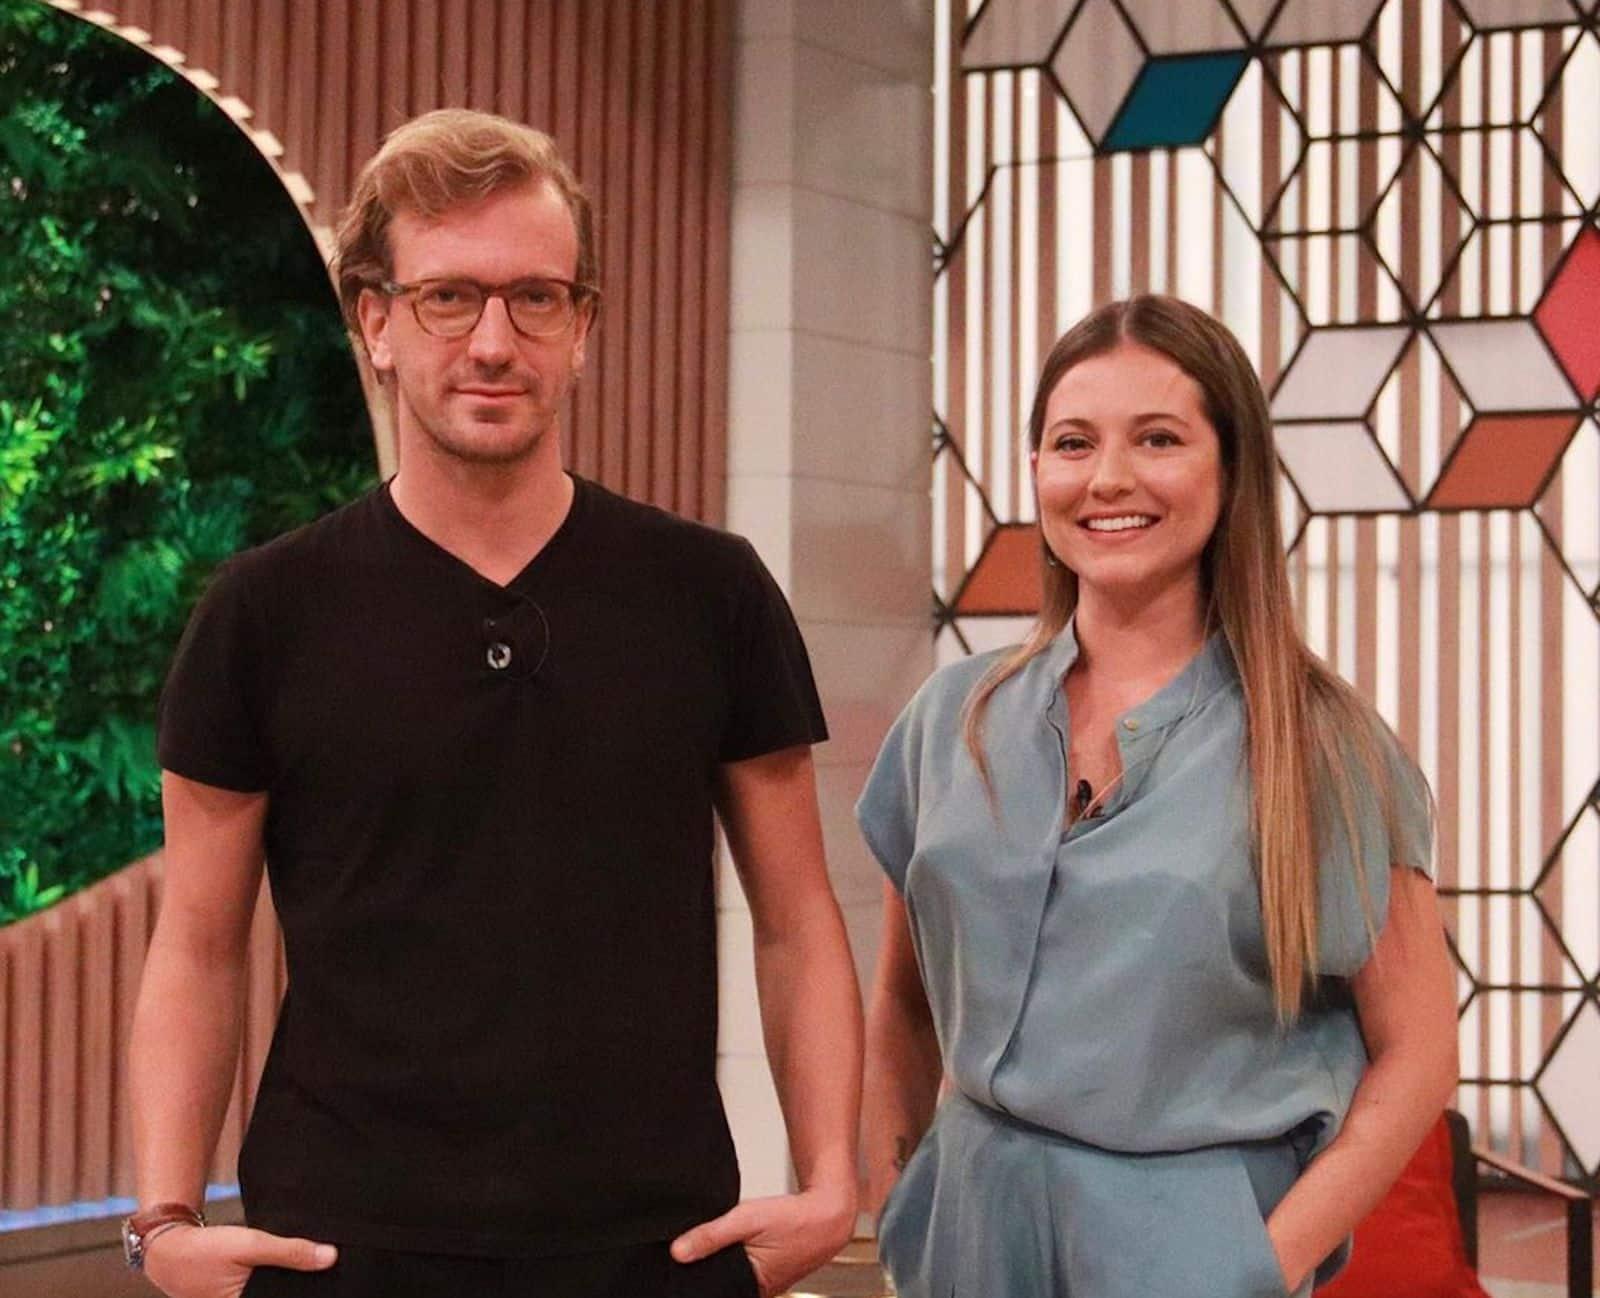 Ana-Catharina-Diogo-Big-Brother-Voce-Na-Tv